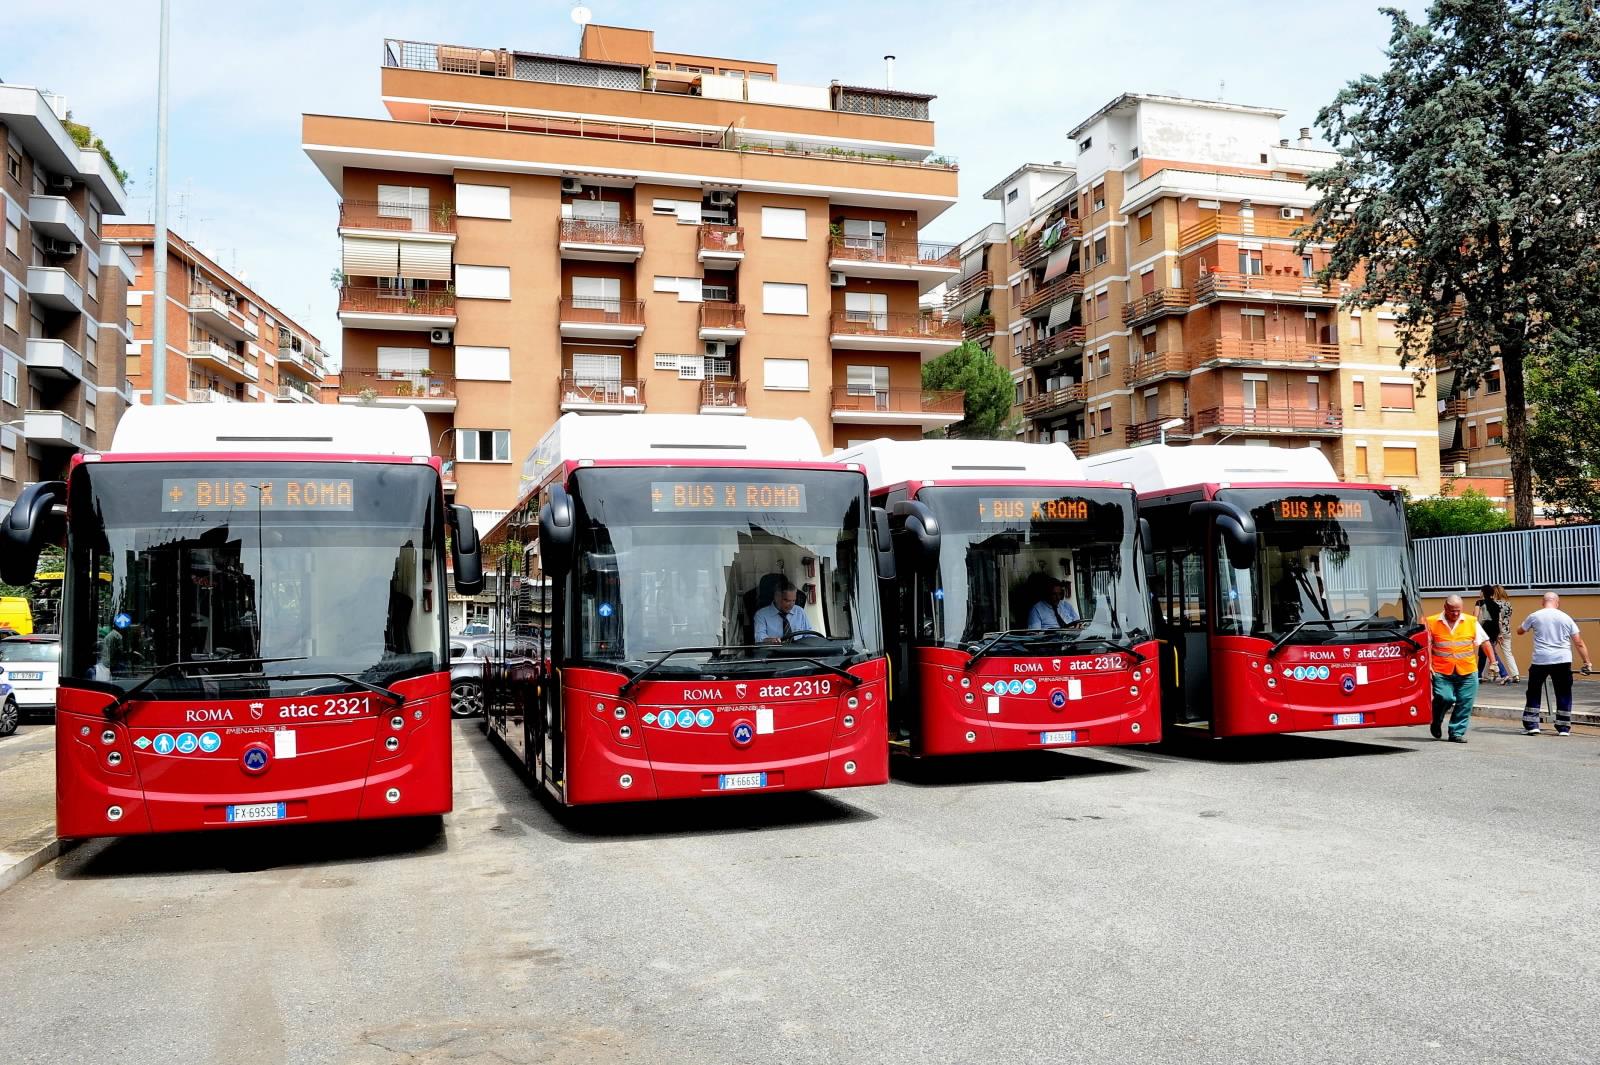 I nuovi autobus acquistati da Roma Capitale